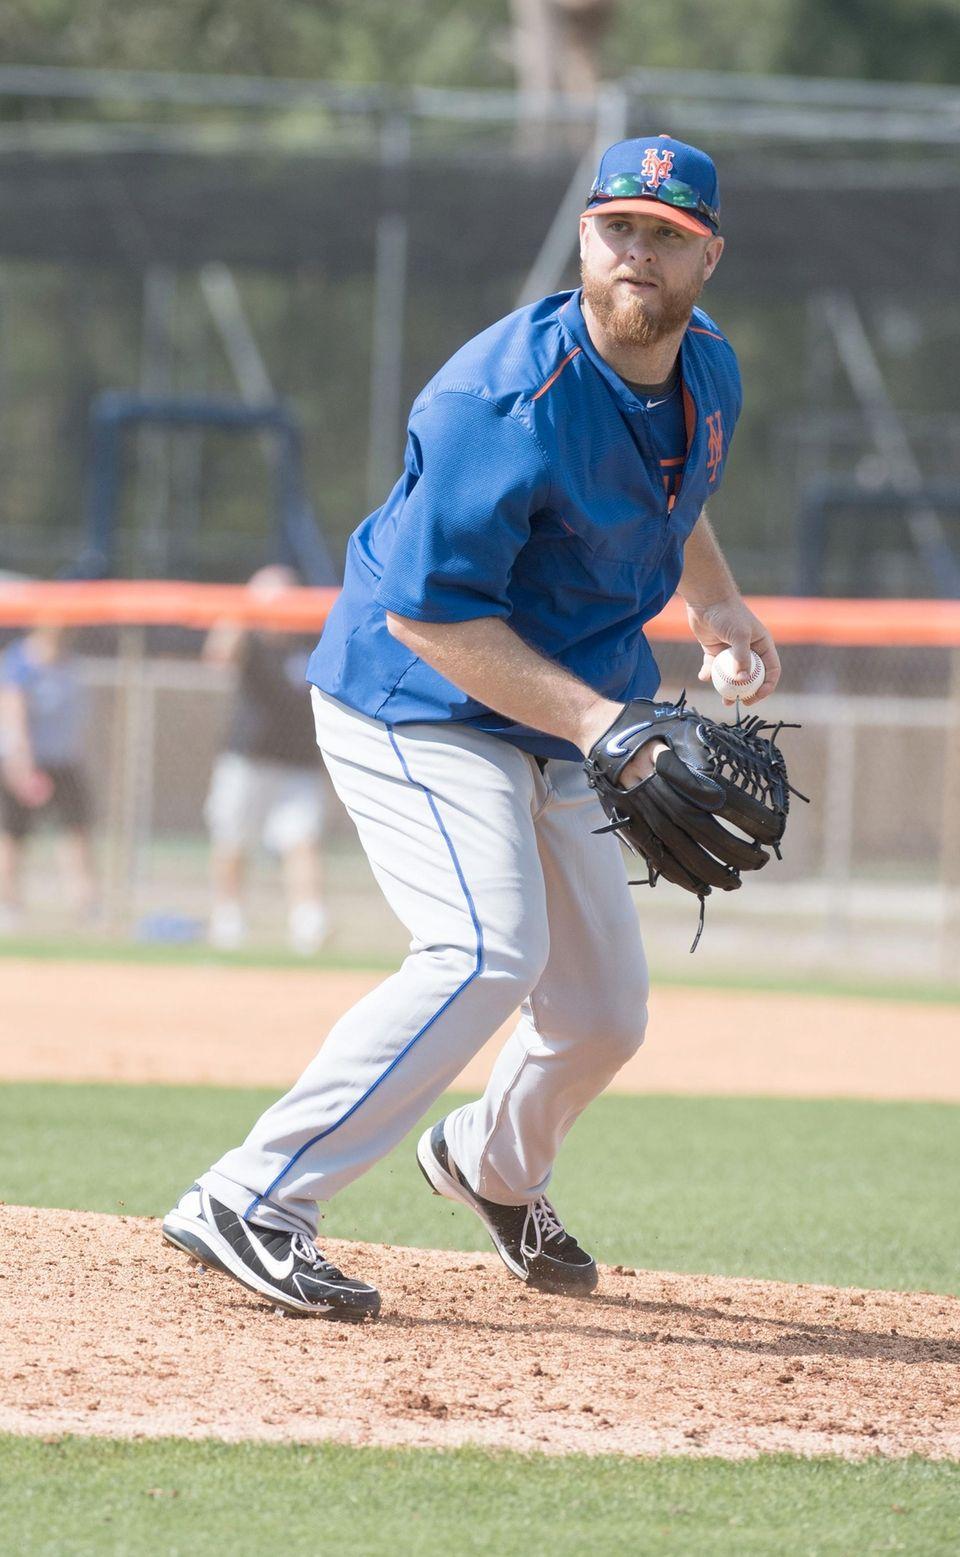 Mets pitcher Josh Edgin fields the ball during